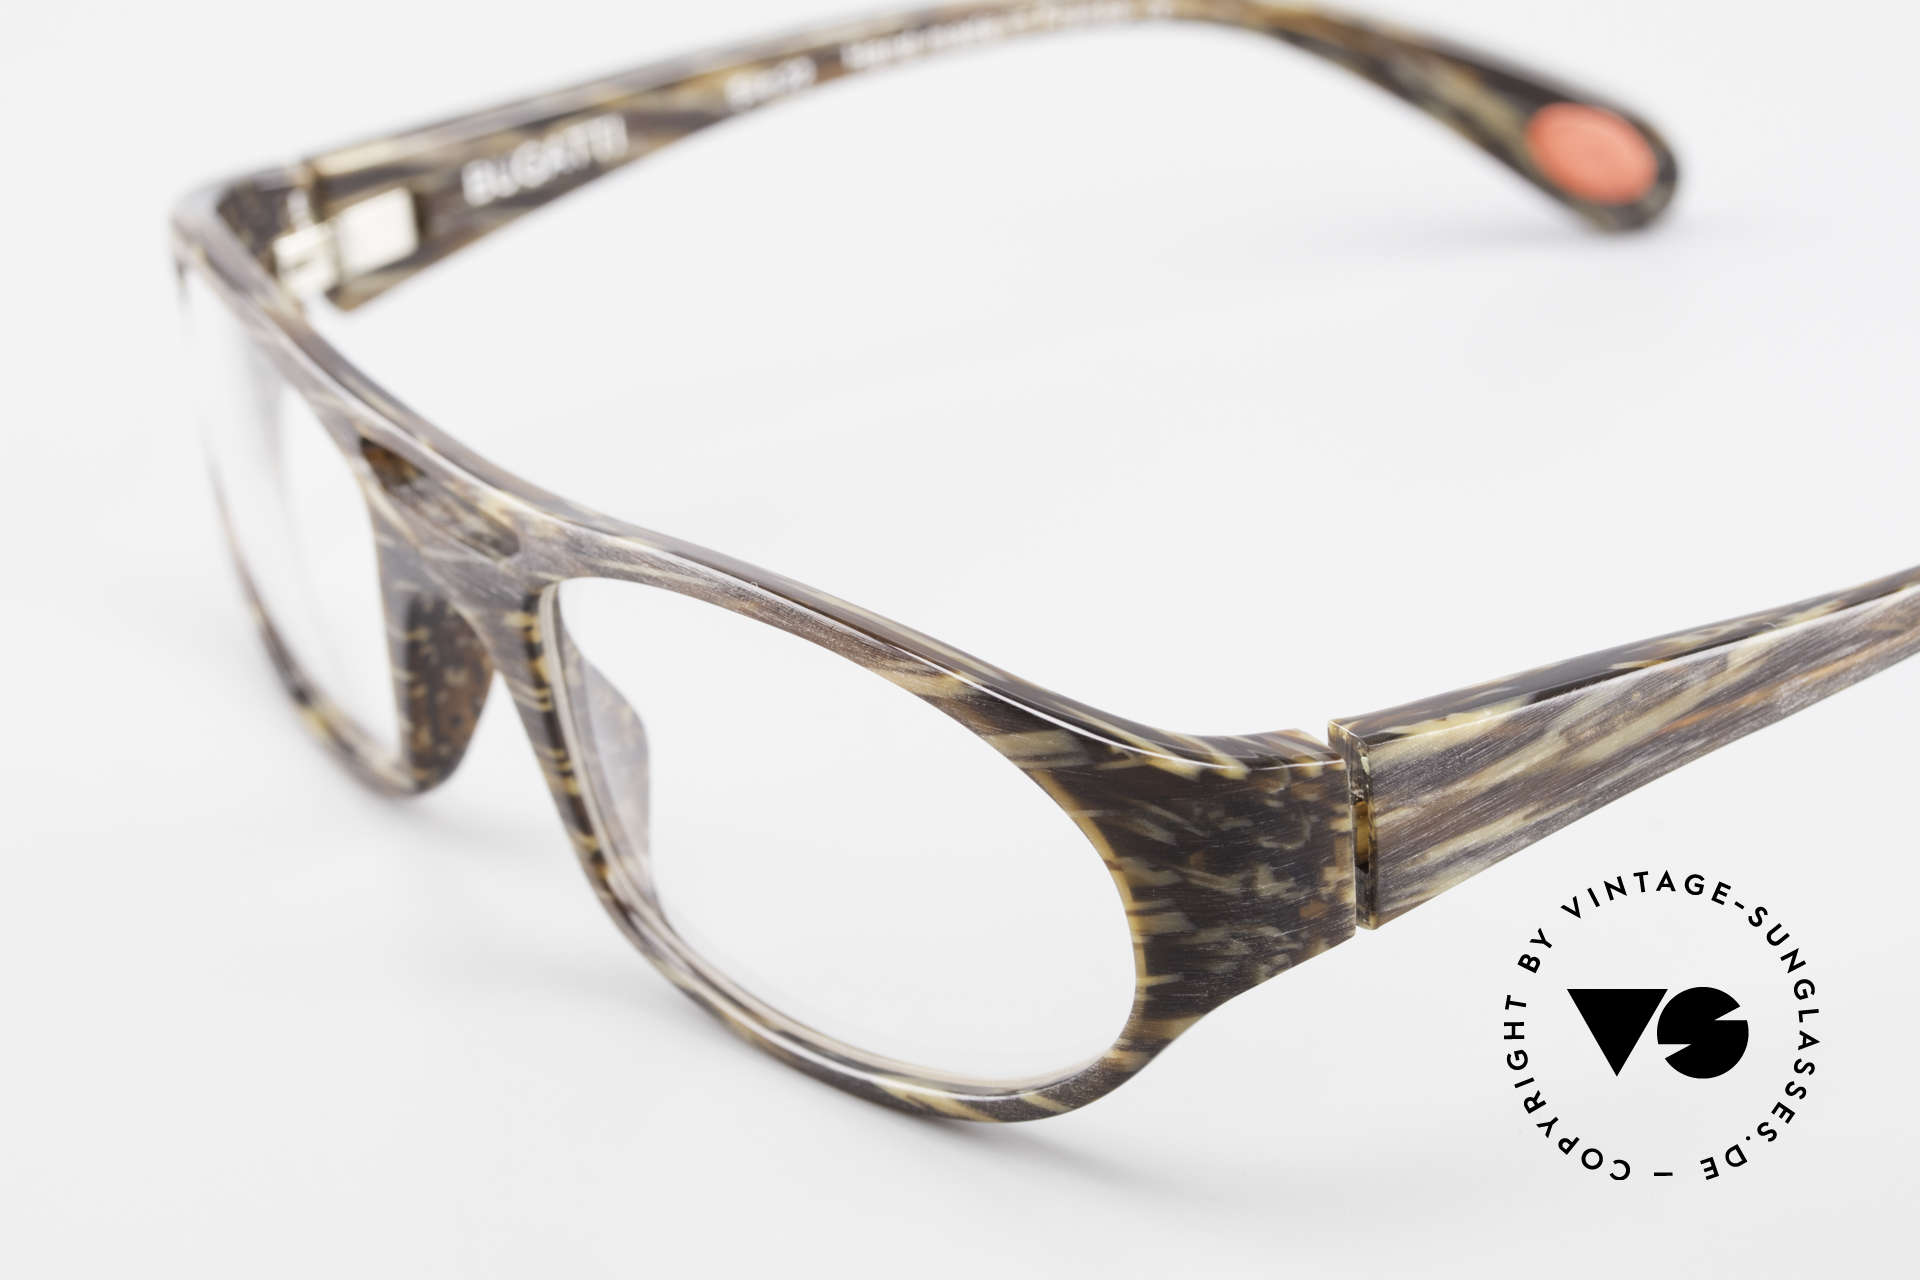 Bugatti 220 Men's Designer Luxury Glasses, unworn model comes with orig. case & packing, Made for Men